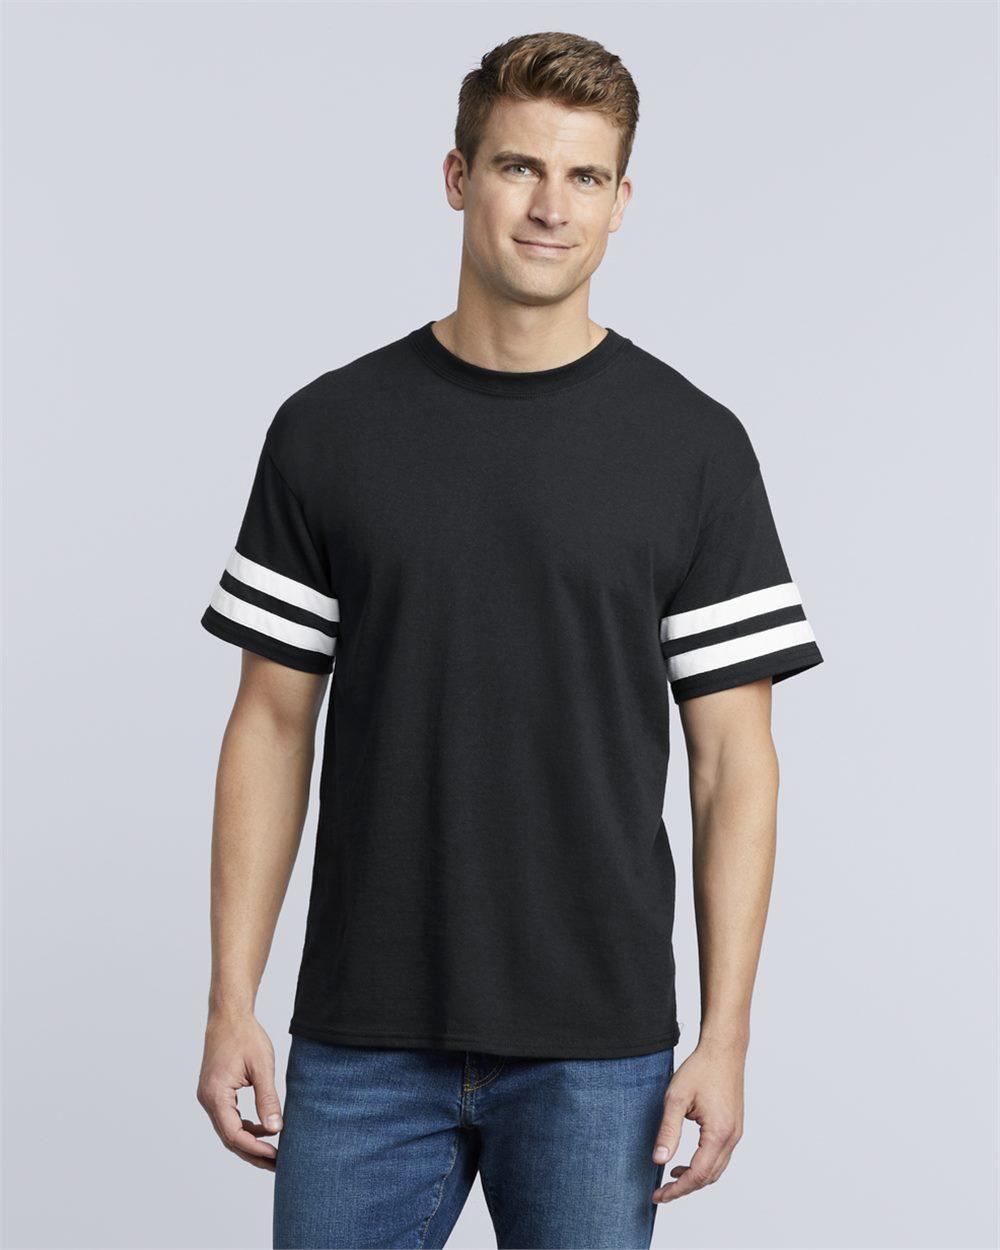 Gildan 500VT - Heavy Cotton Adult Victory T-Shirt